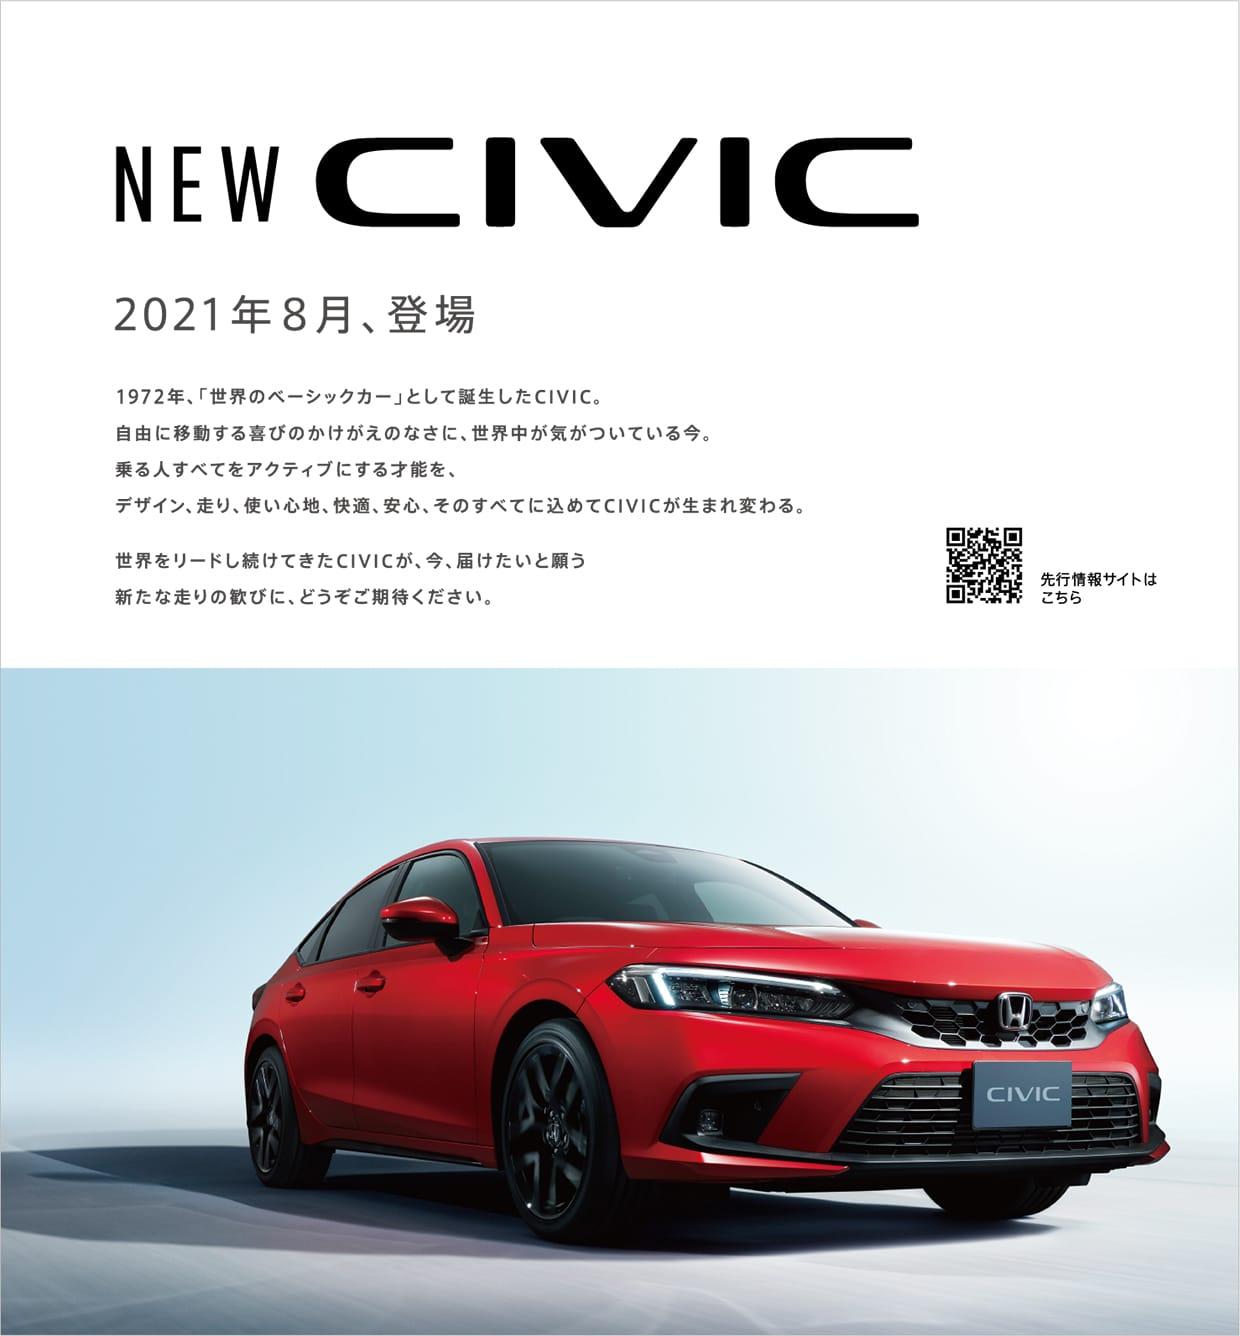 NEW CIVIC 2021年8月、登場